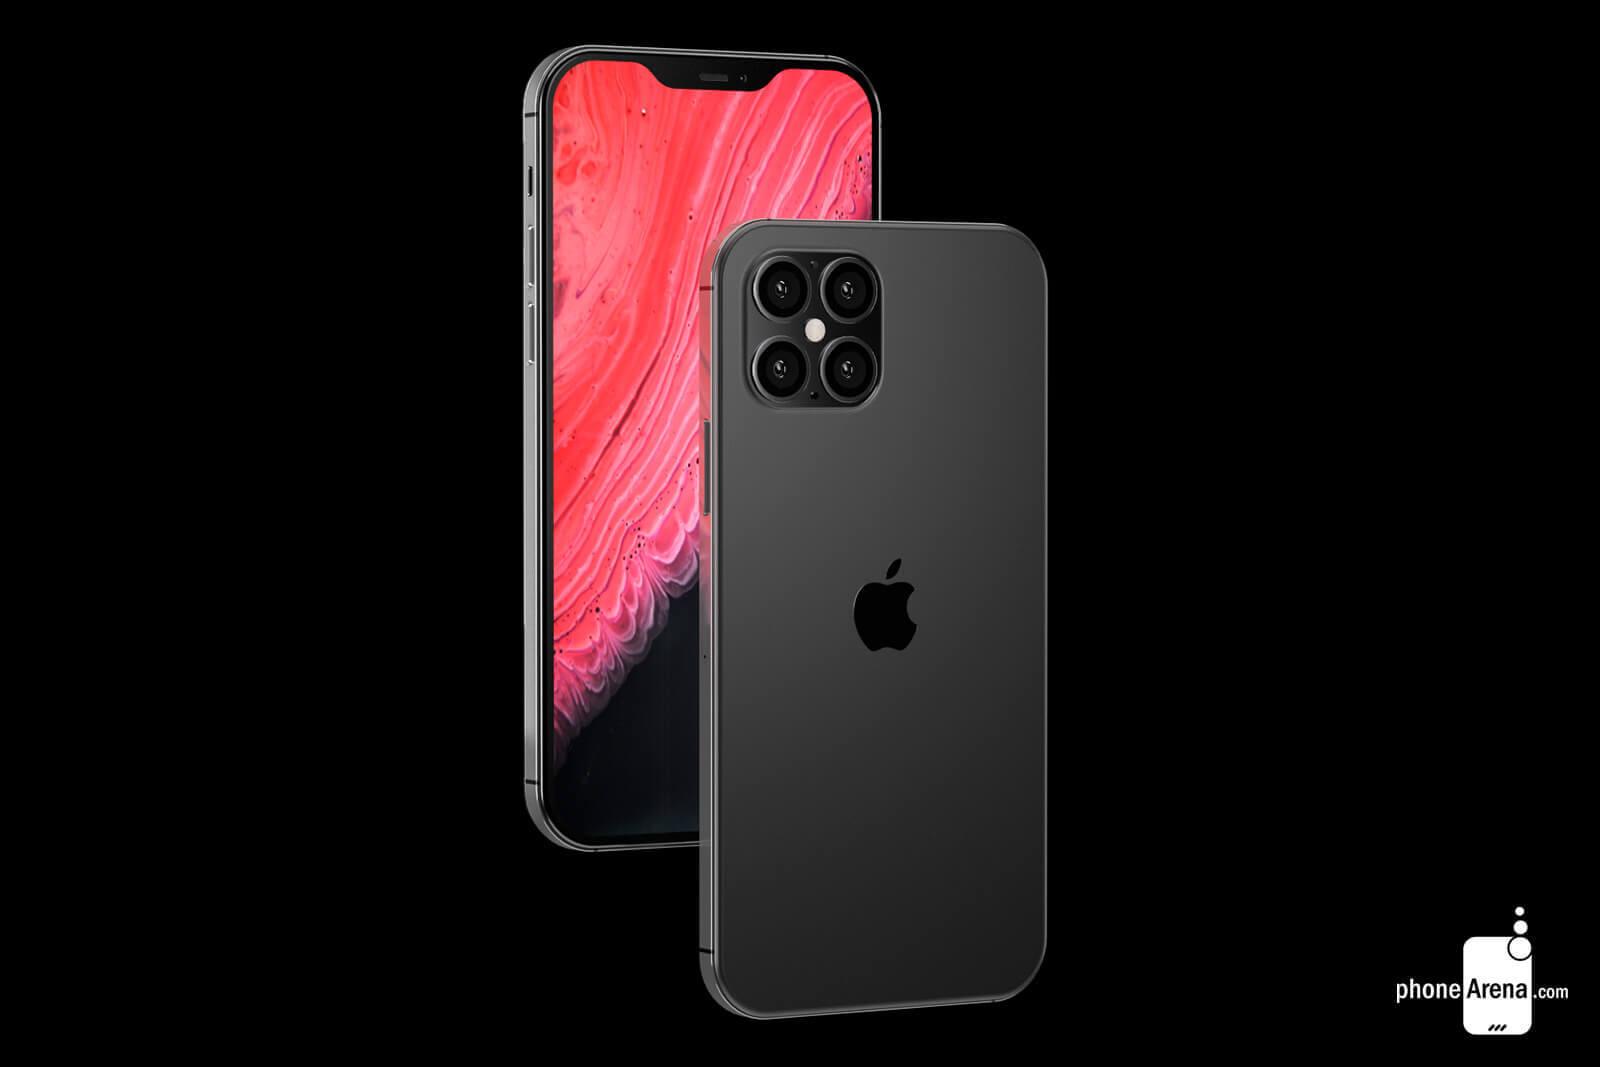 Düstere Aussicht: Kommt 5G zu langsam, leiden die iPhone 12-Verkäufe • Apfellike.com